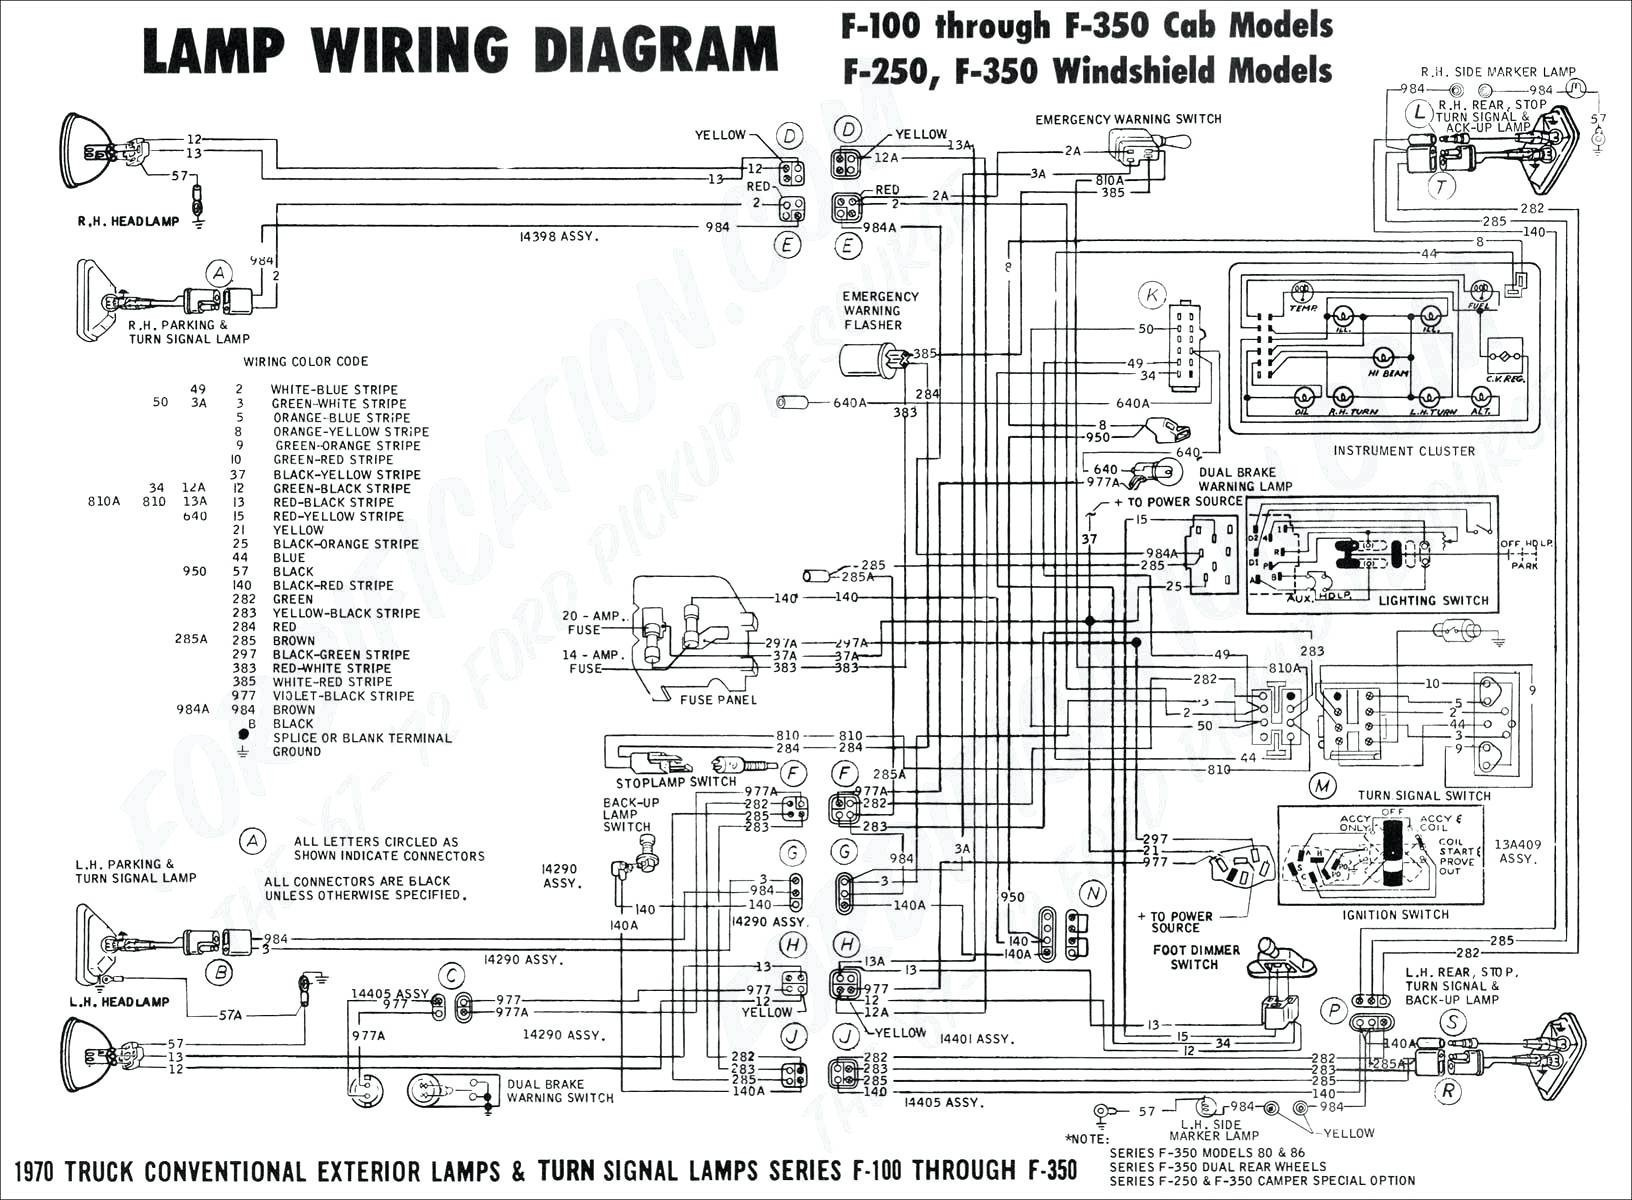 1998 Buick Century Engine Diagram 1998 Buick Fuse Box Wiring Diagram Week Of 1998 Buick Century Engine Diagram